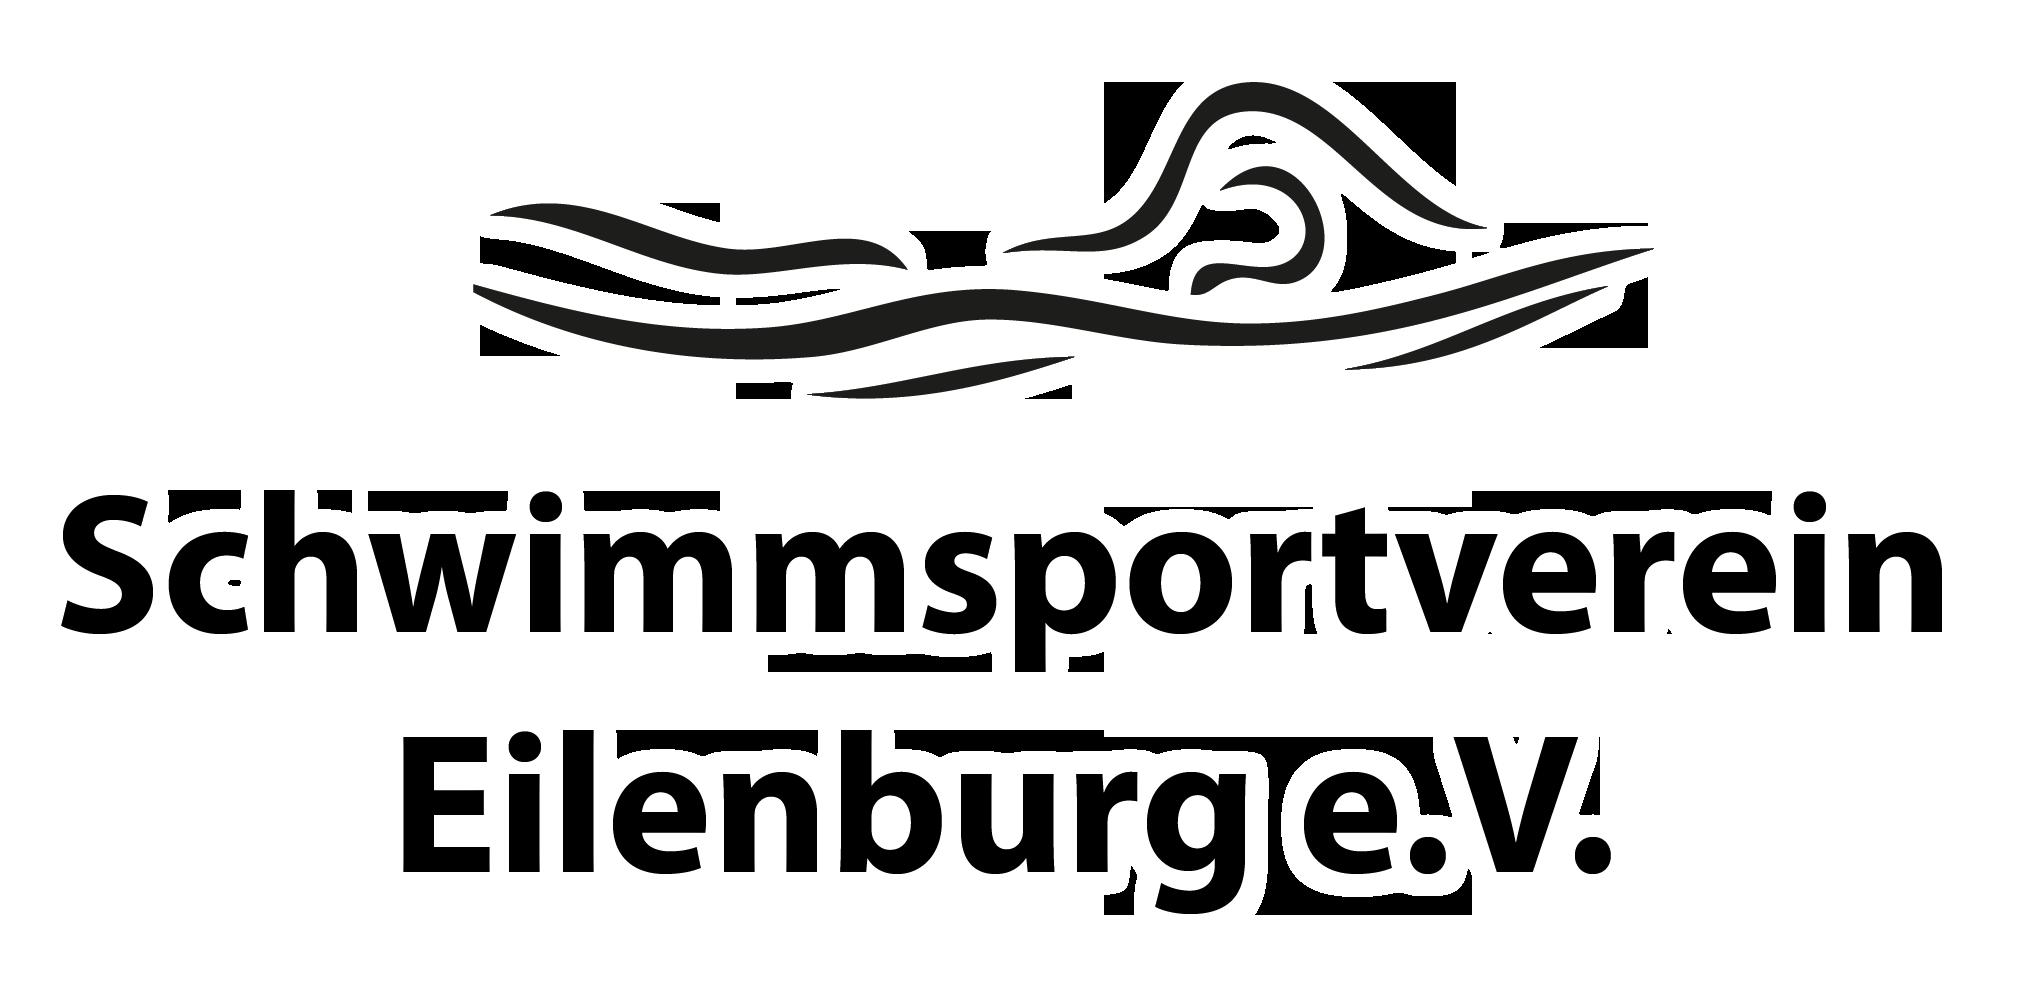 Schwimmsportverein Eilenburg e.V.